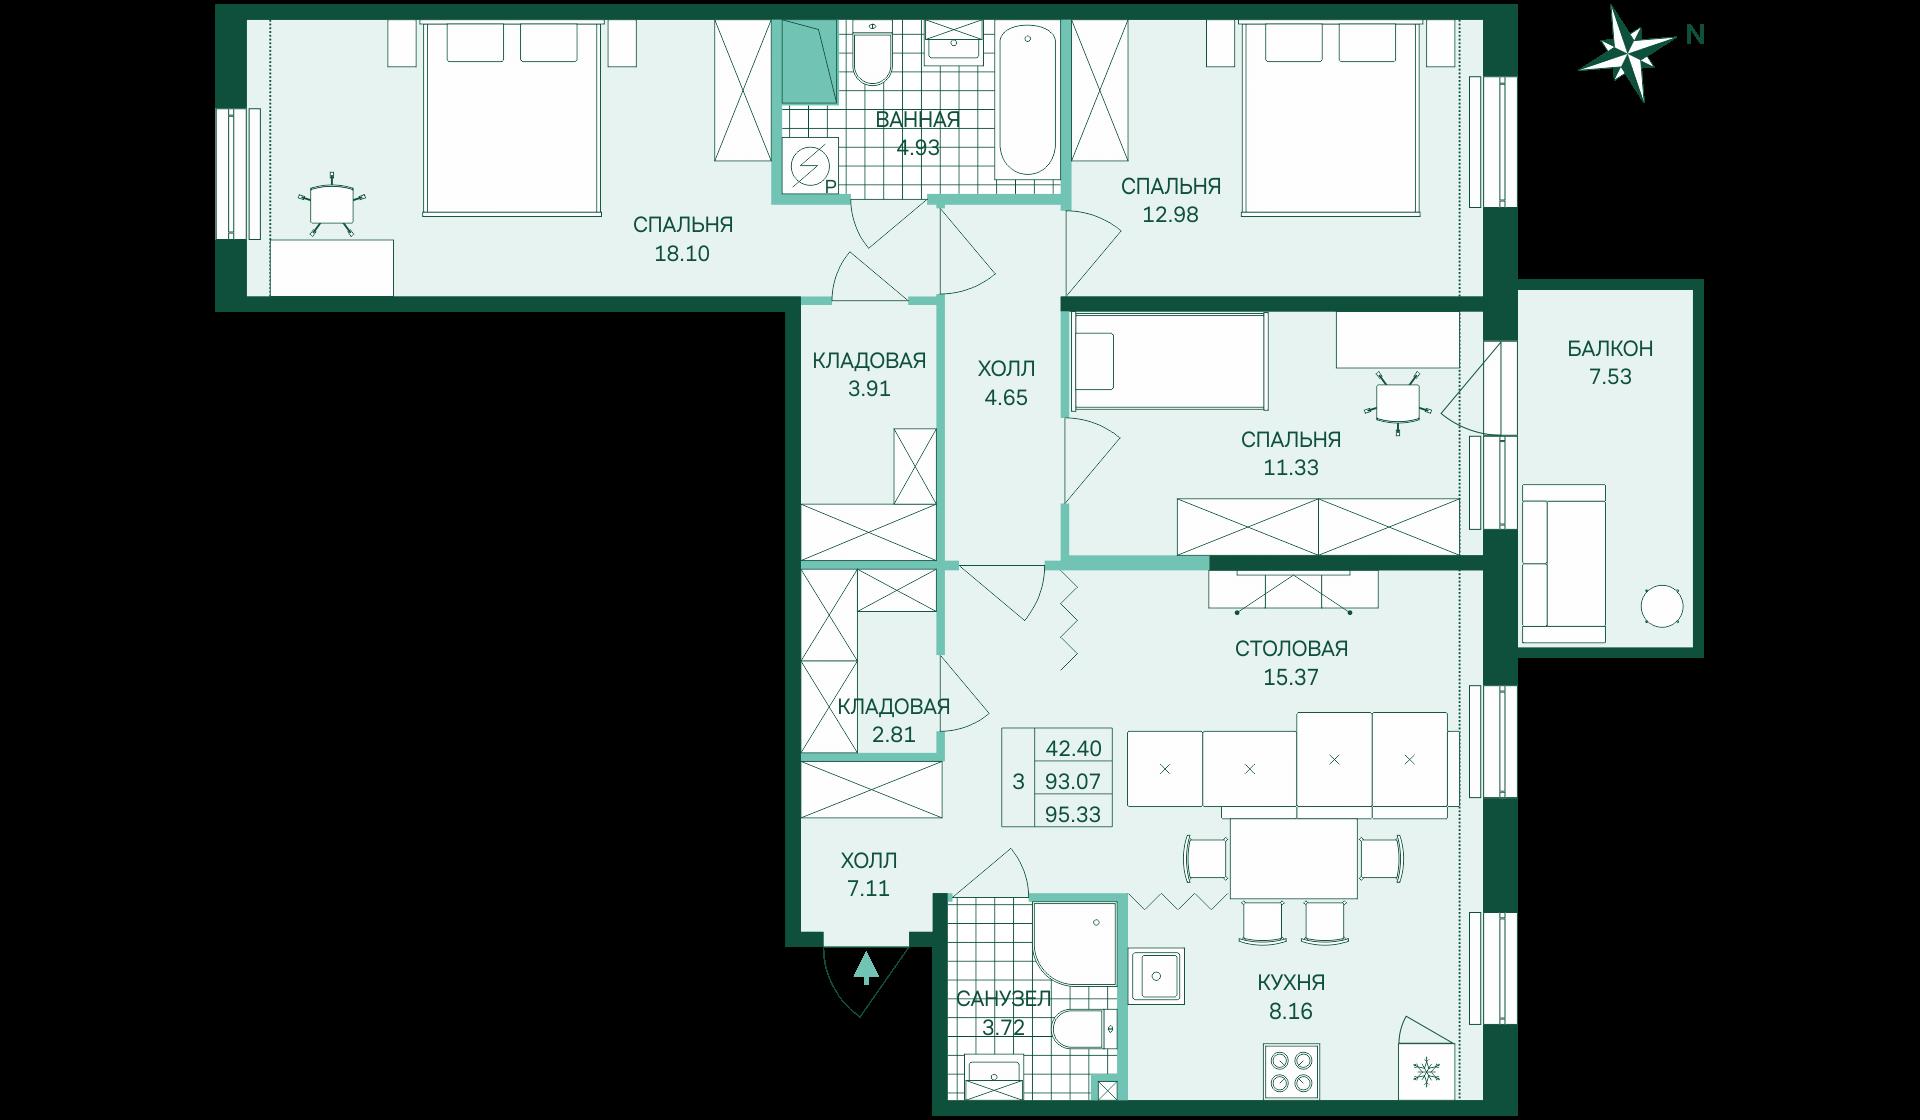 Планировка Трёхкомнатная квартира площадью 95.33 кв.м в ЖК «Skandi Klubb»